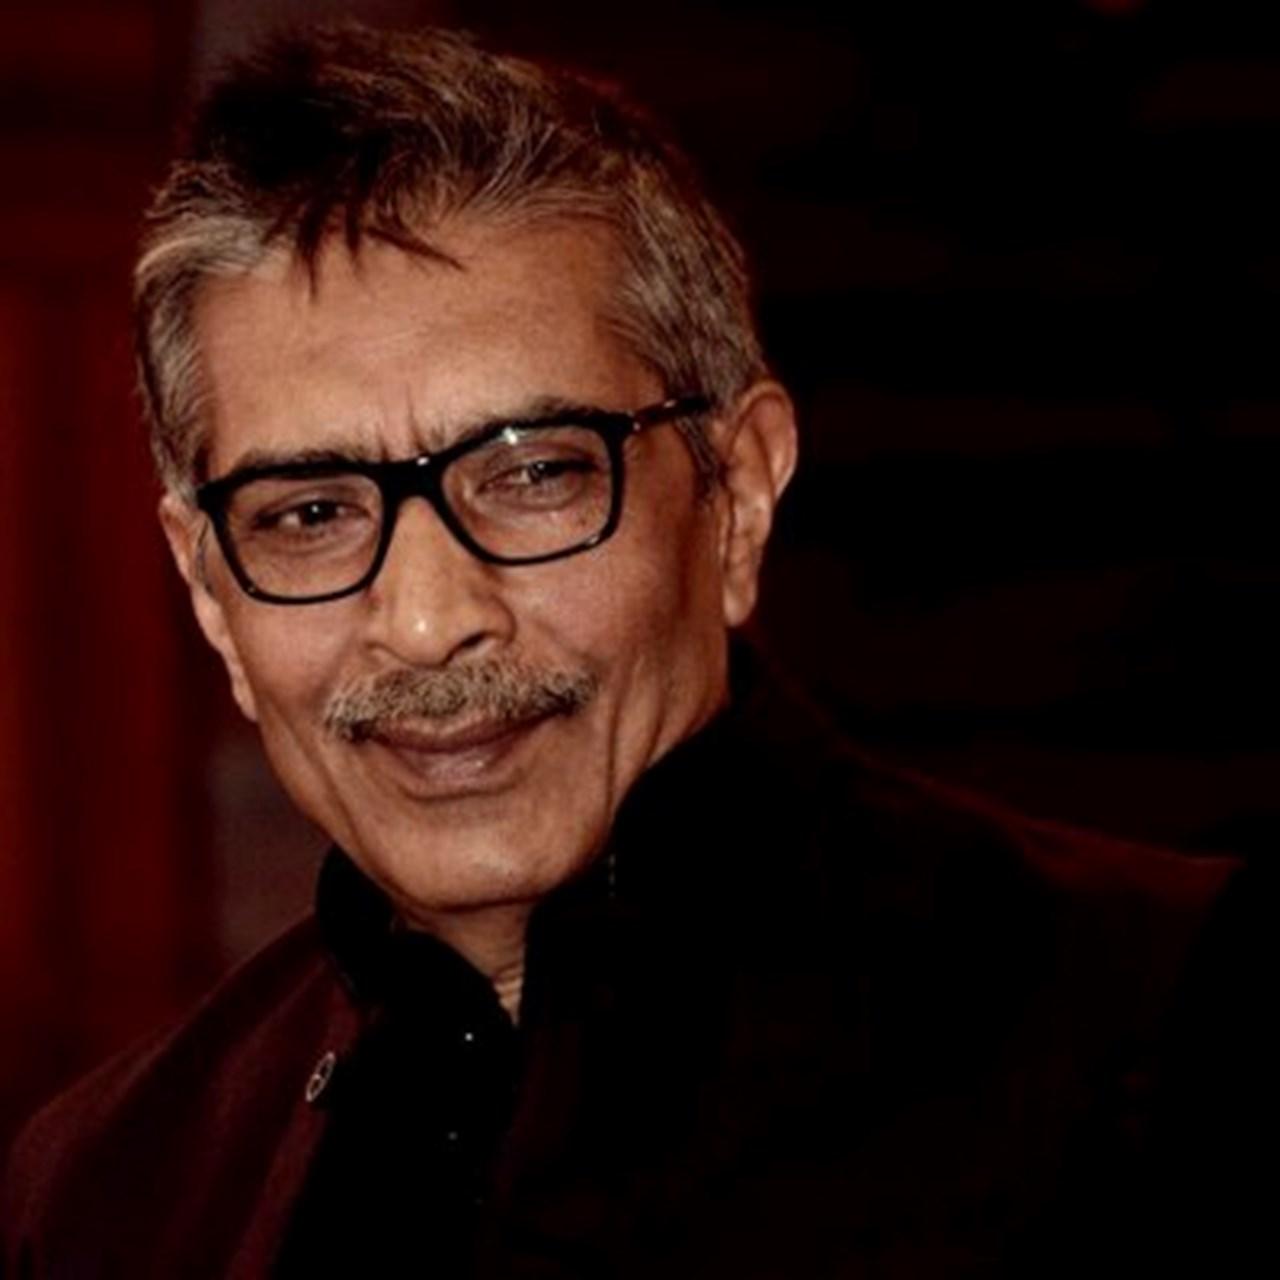 I want to do characters i enjoy. That's the criteria, says Prakash Jha